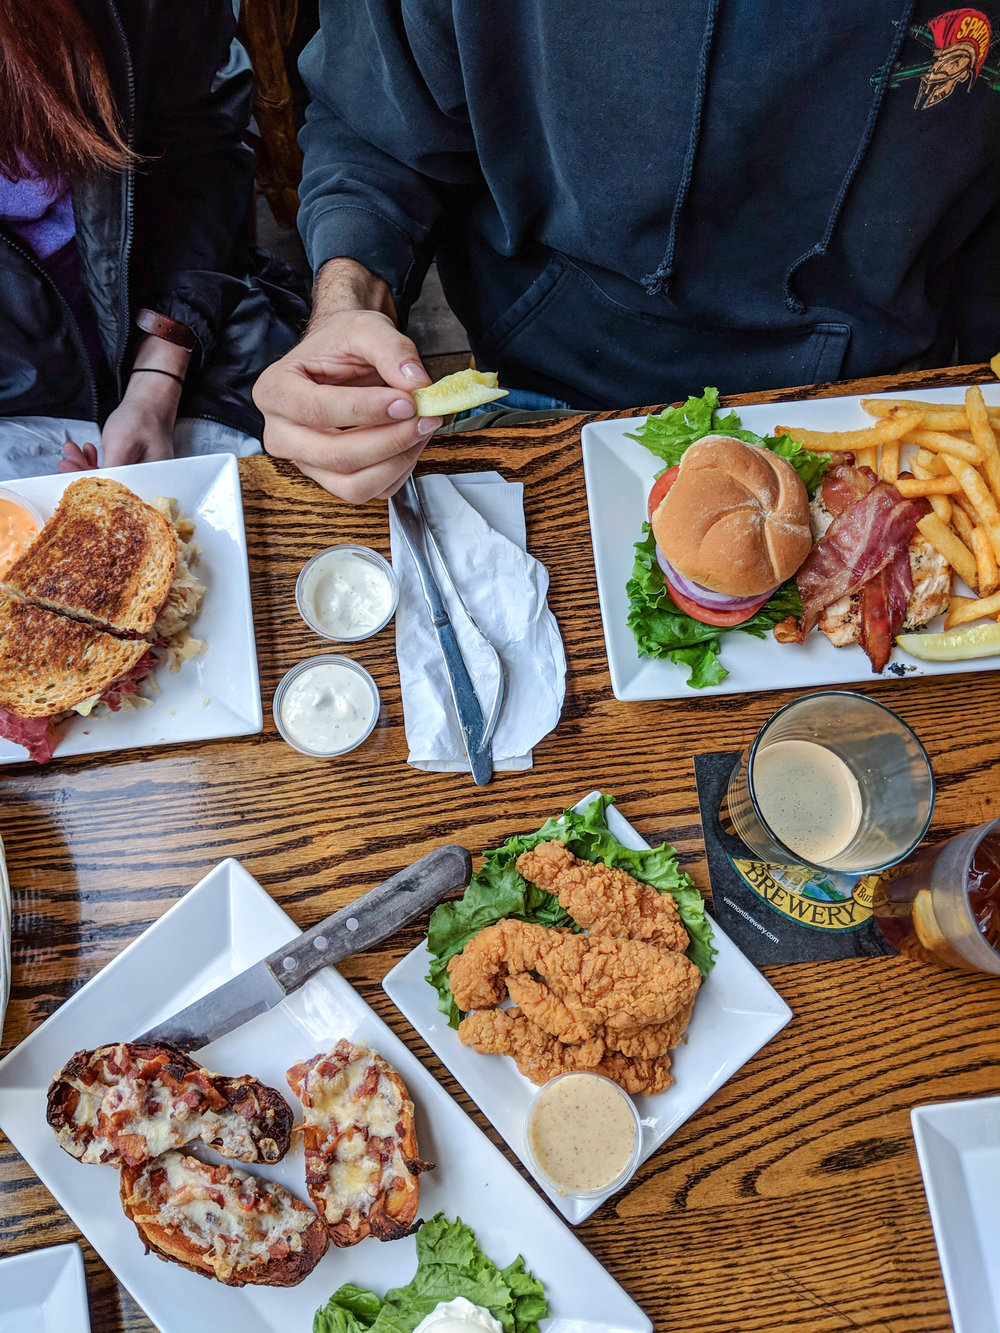 bri rinehart; brand photography; restaurant; food